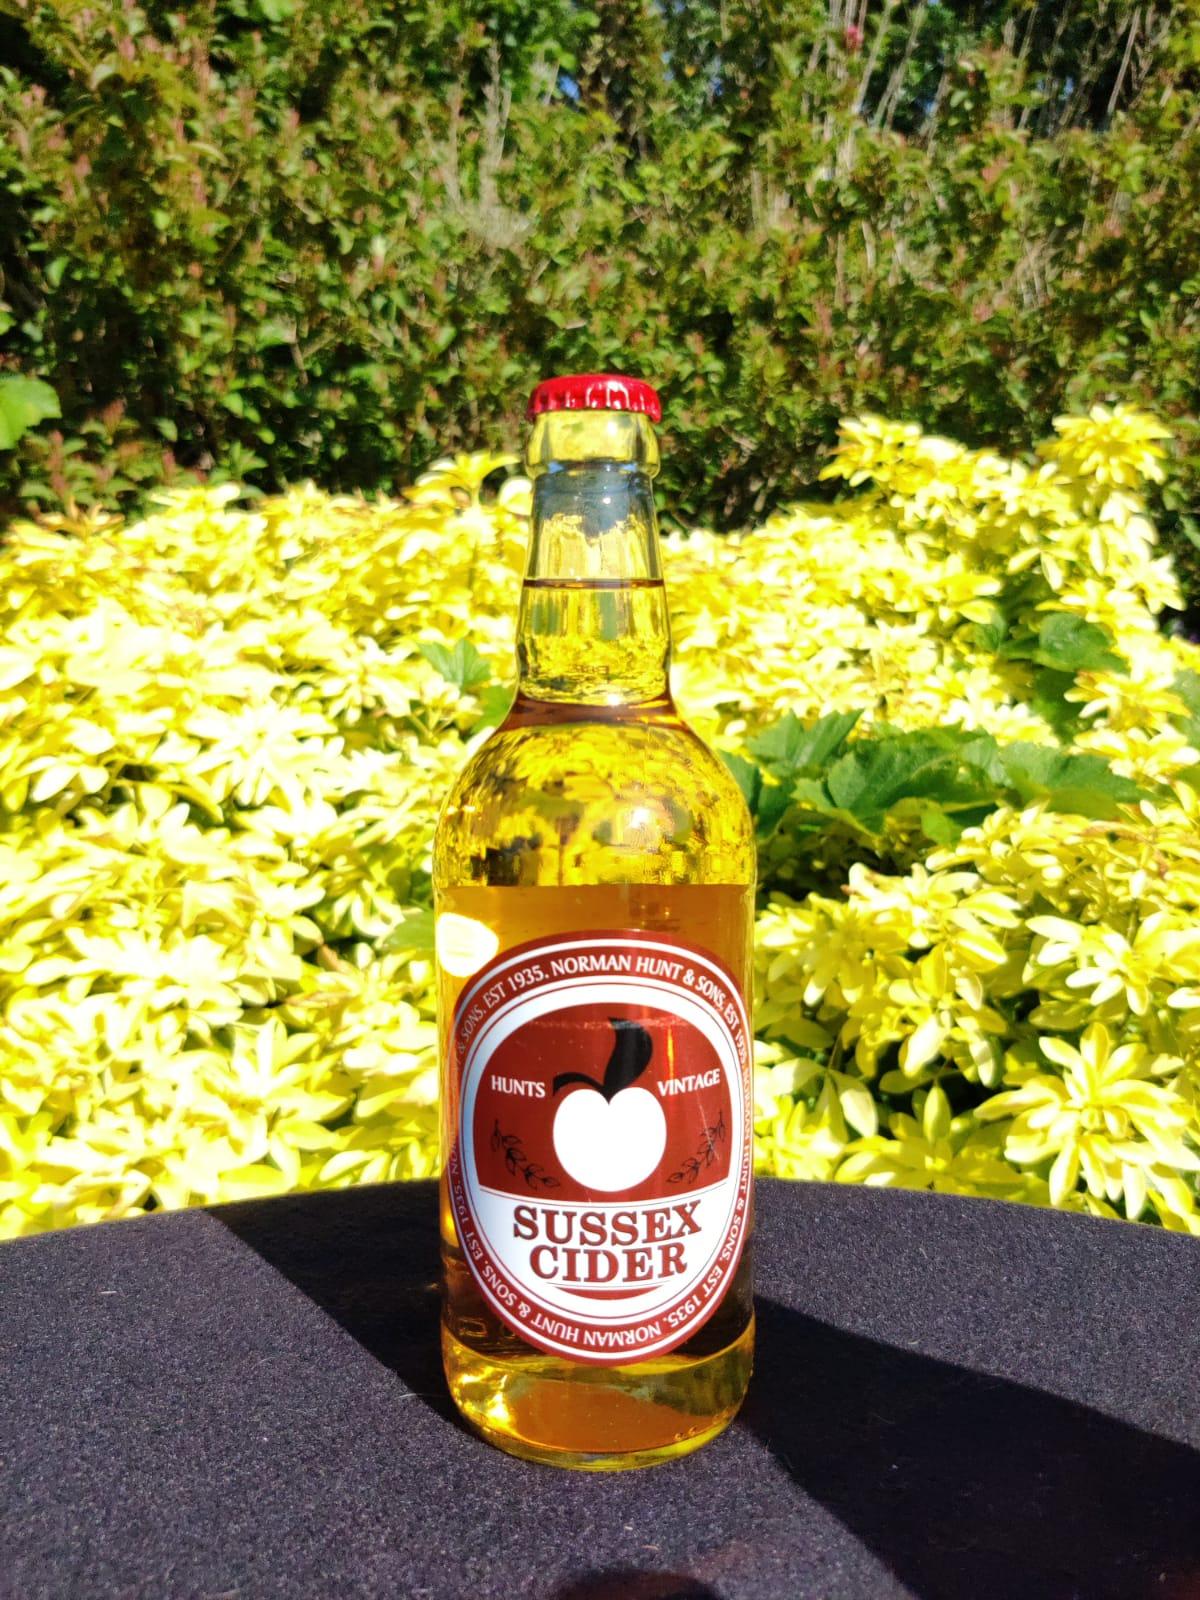 Hunt's Sussex Cider 500ml 6.8%